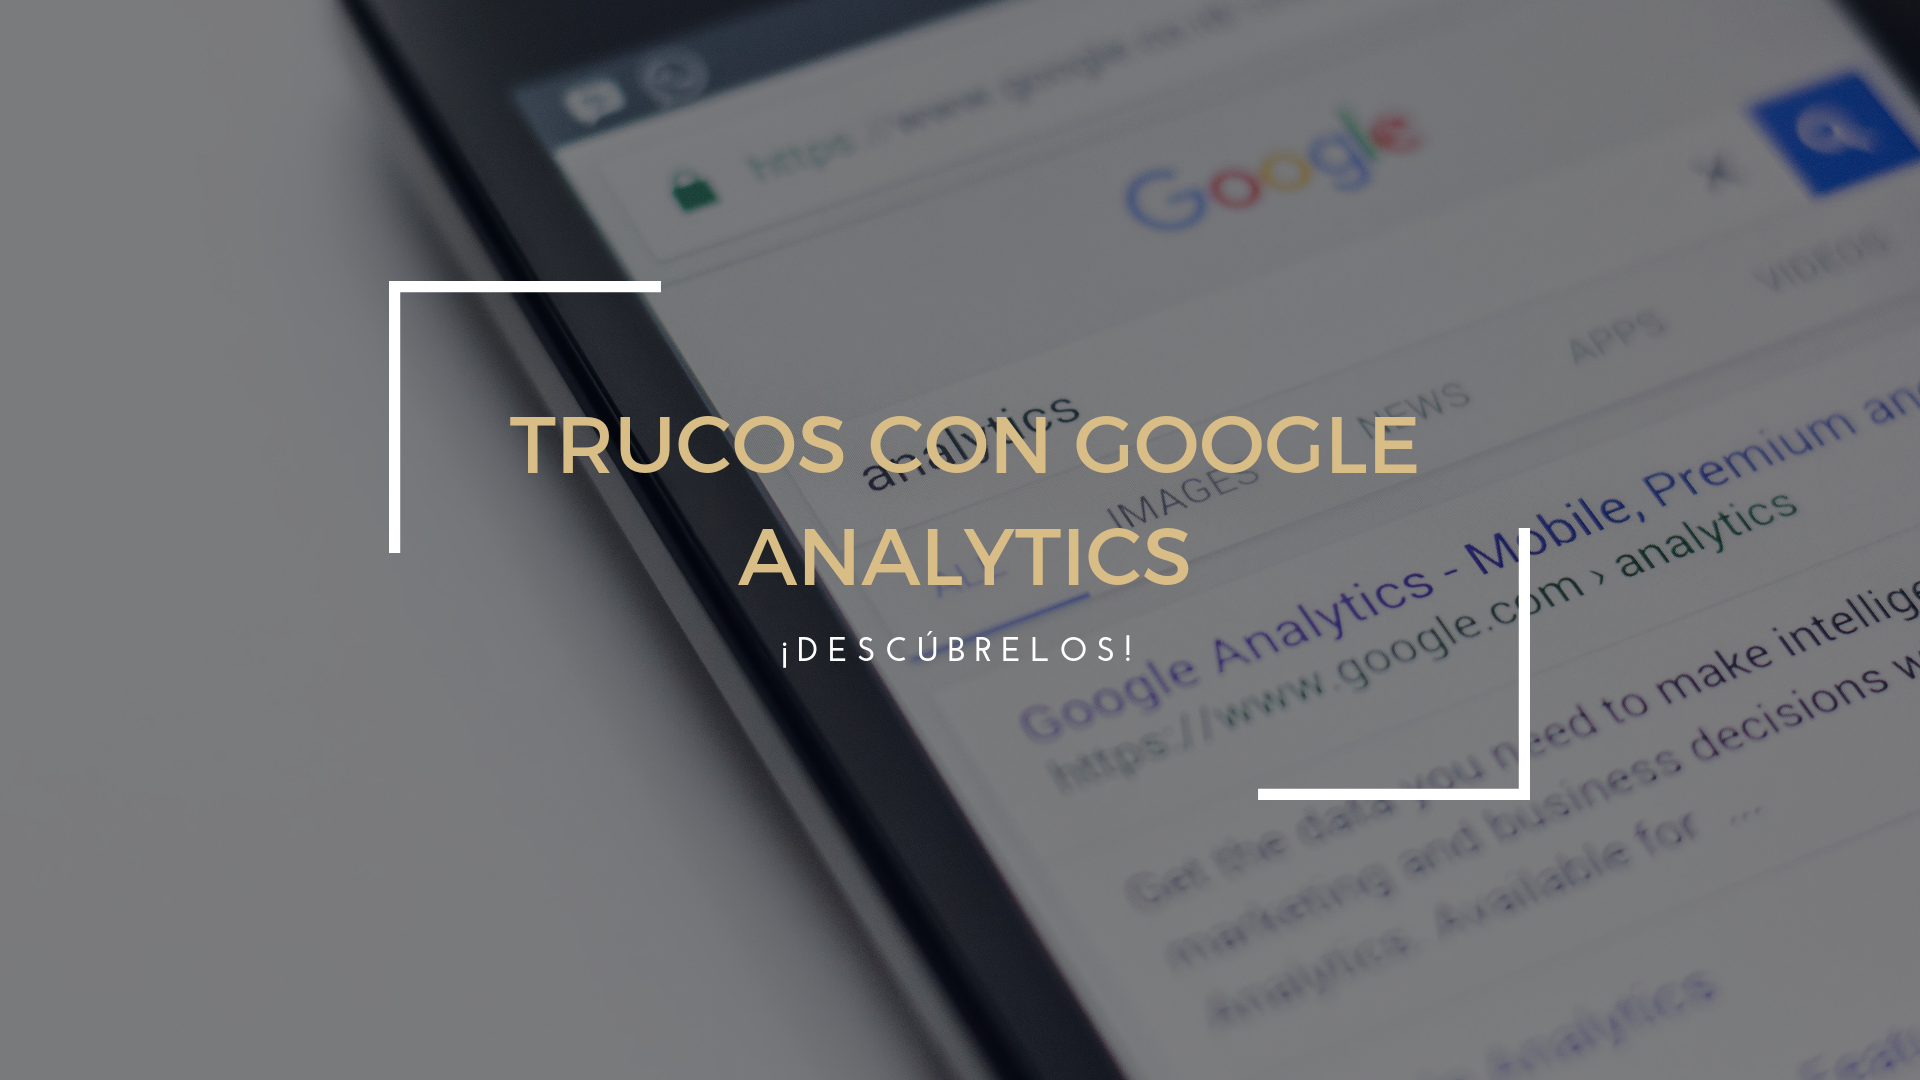 Analítica web: descubriendo trucos con Google